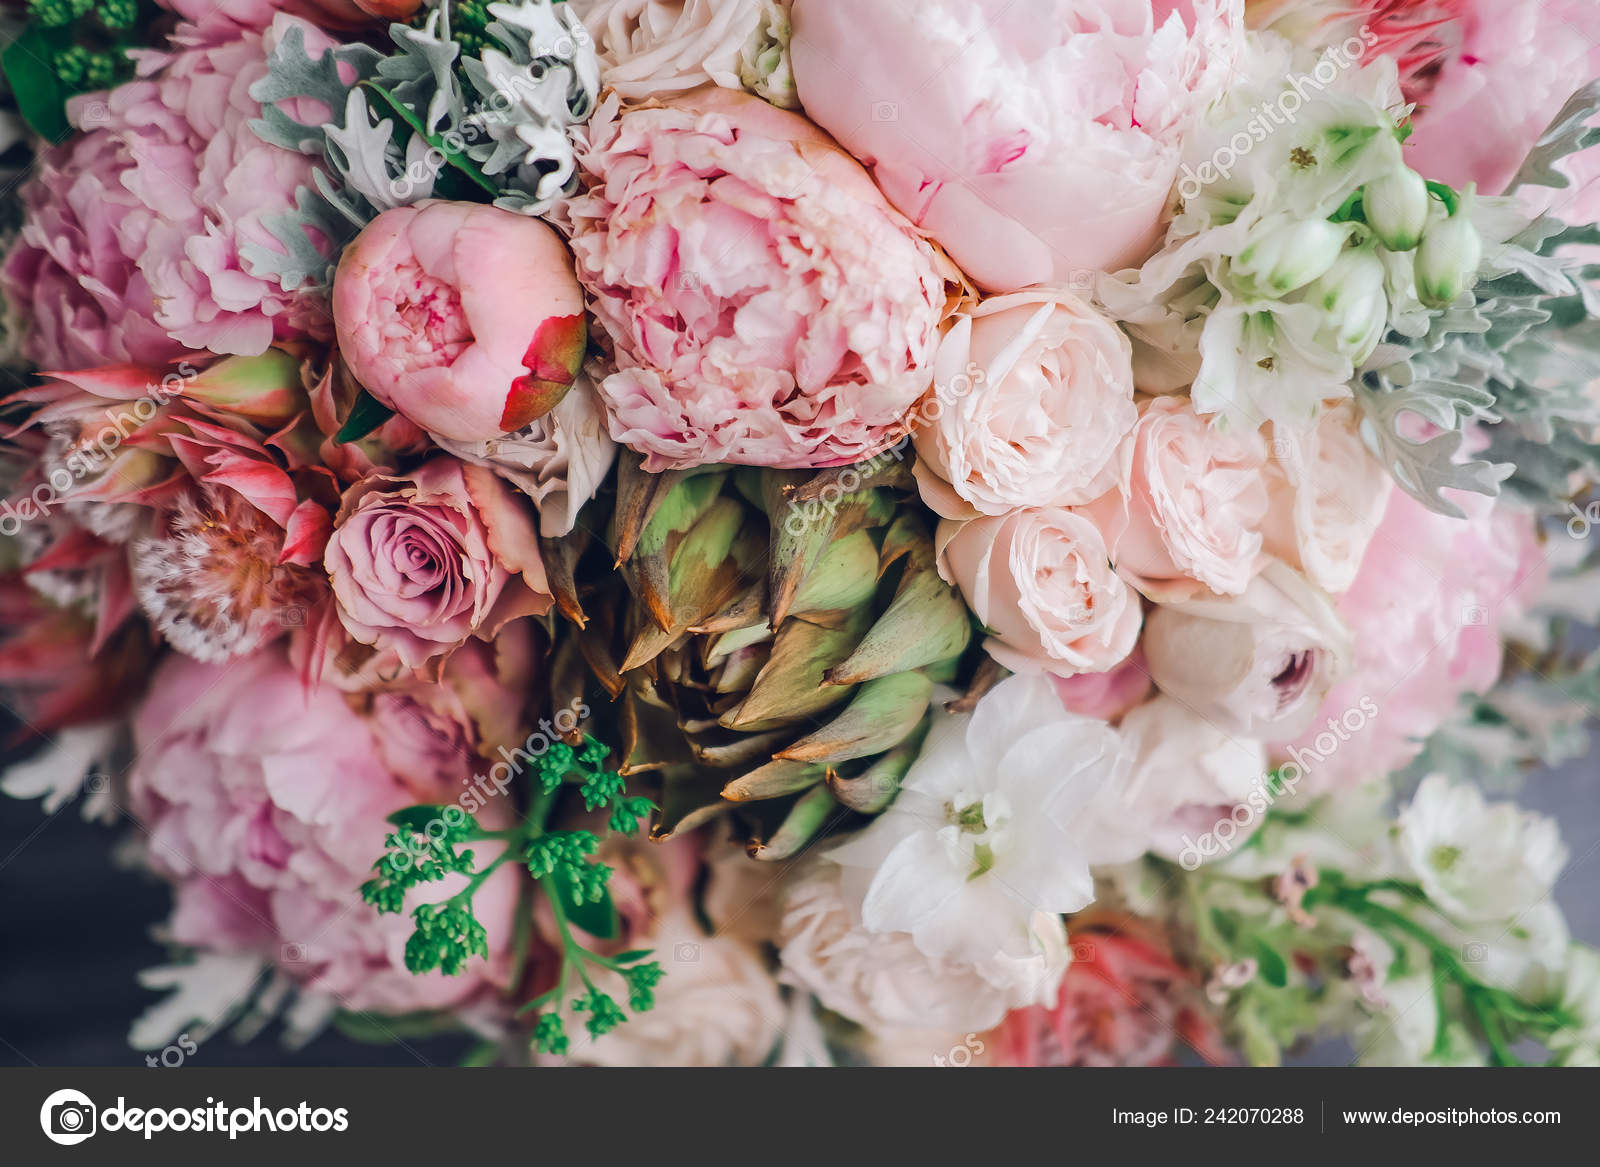 Big Beautiful Wedding Bouquet Spring Flowers Wooden Background Peonies Roses Stock Photo Image By C Dashagrebenchuk Gmail Com 242070288